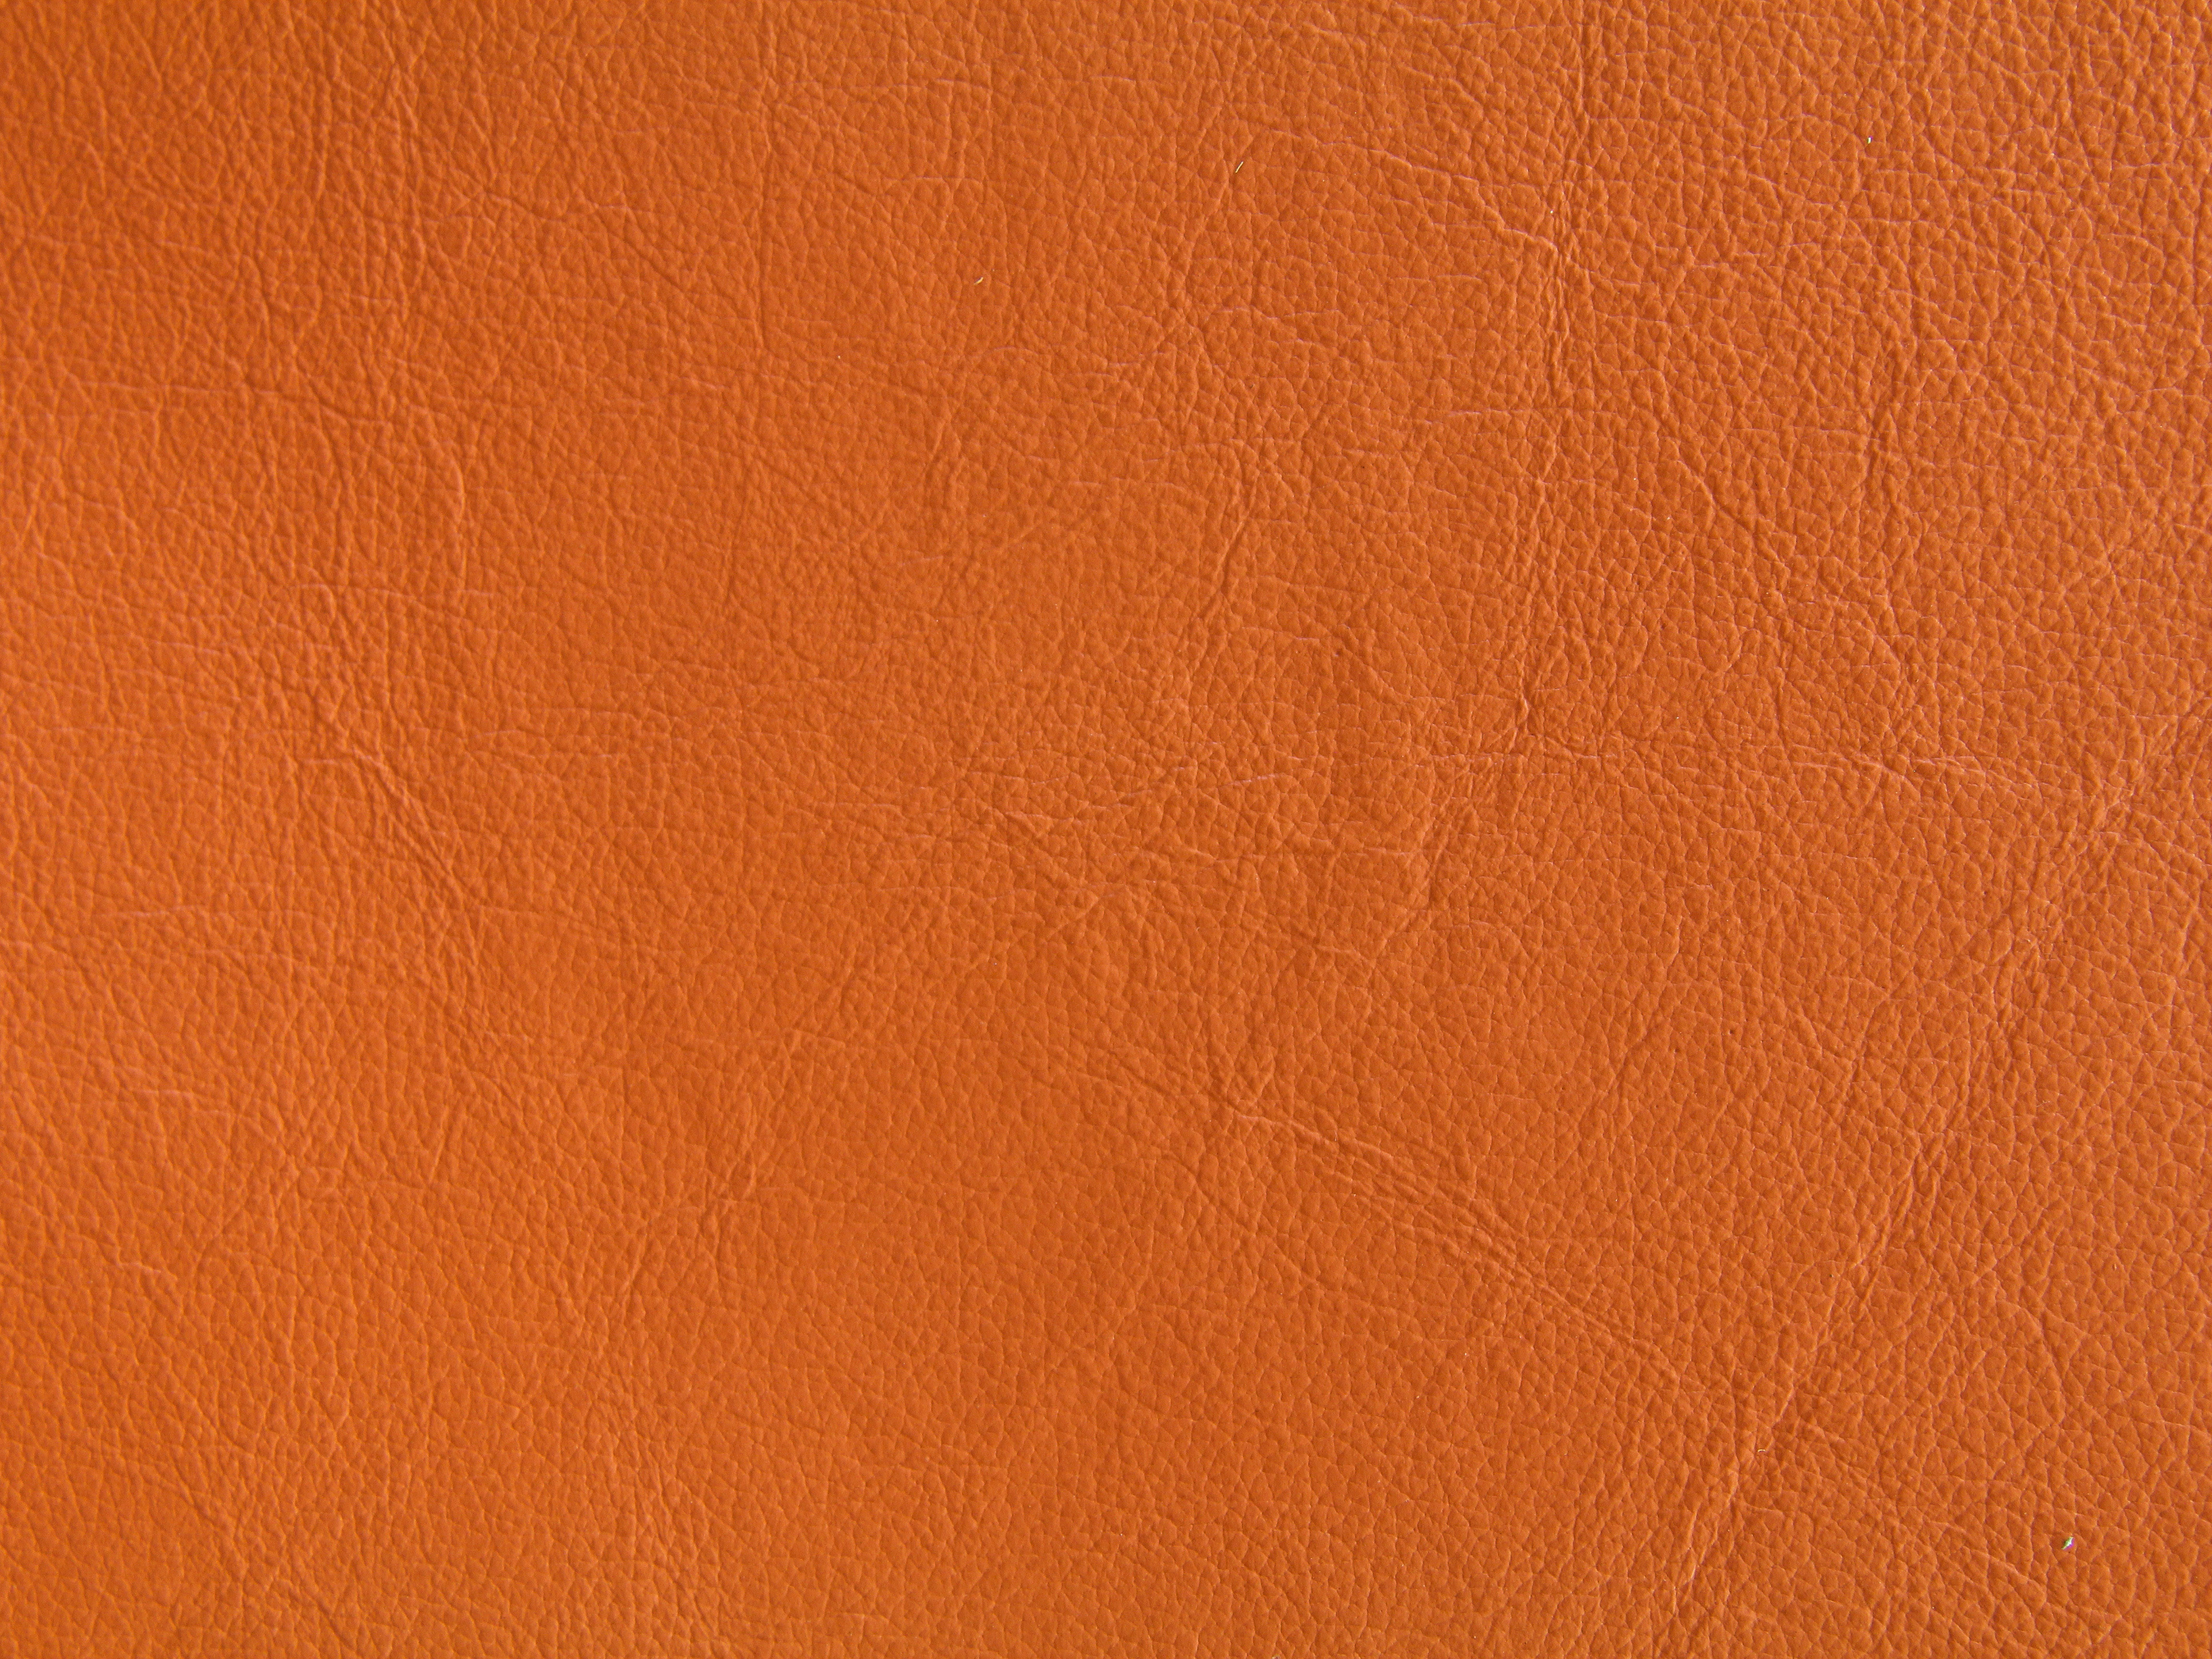 orange-leather-texture-bright-fabric-wallpaper-design-stock-photo ...